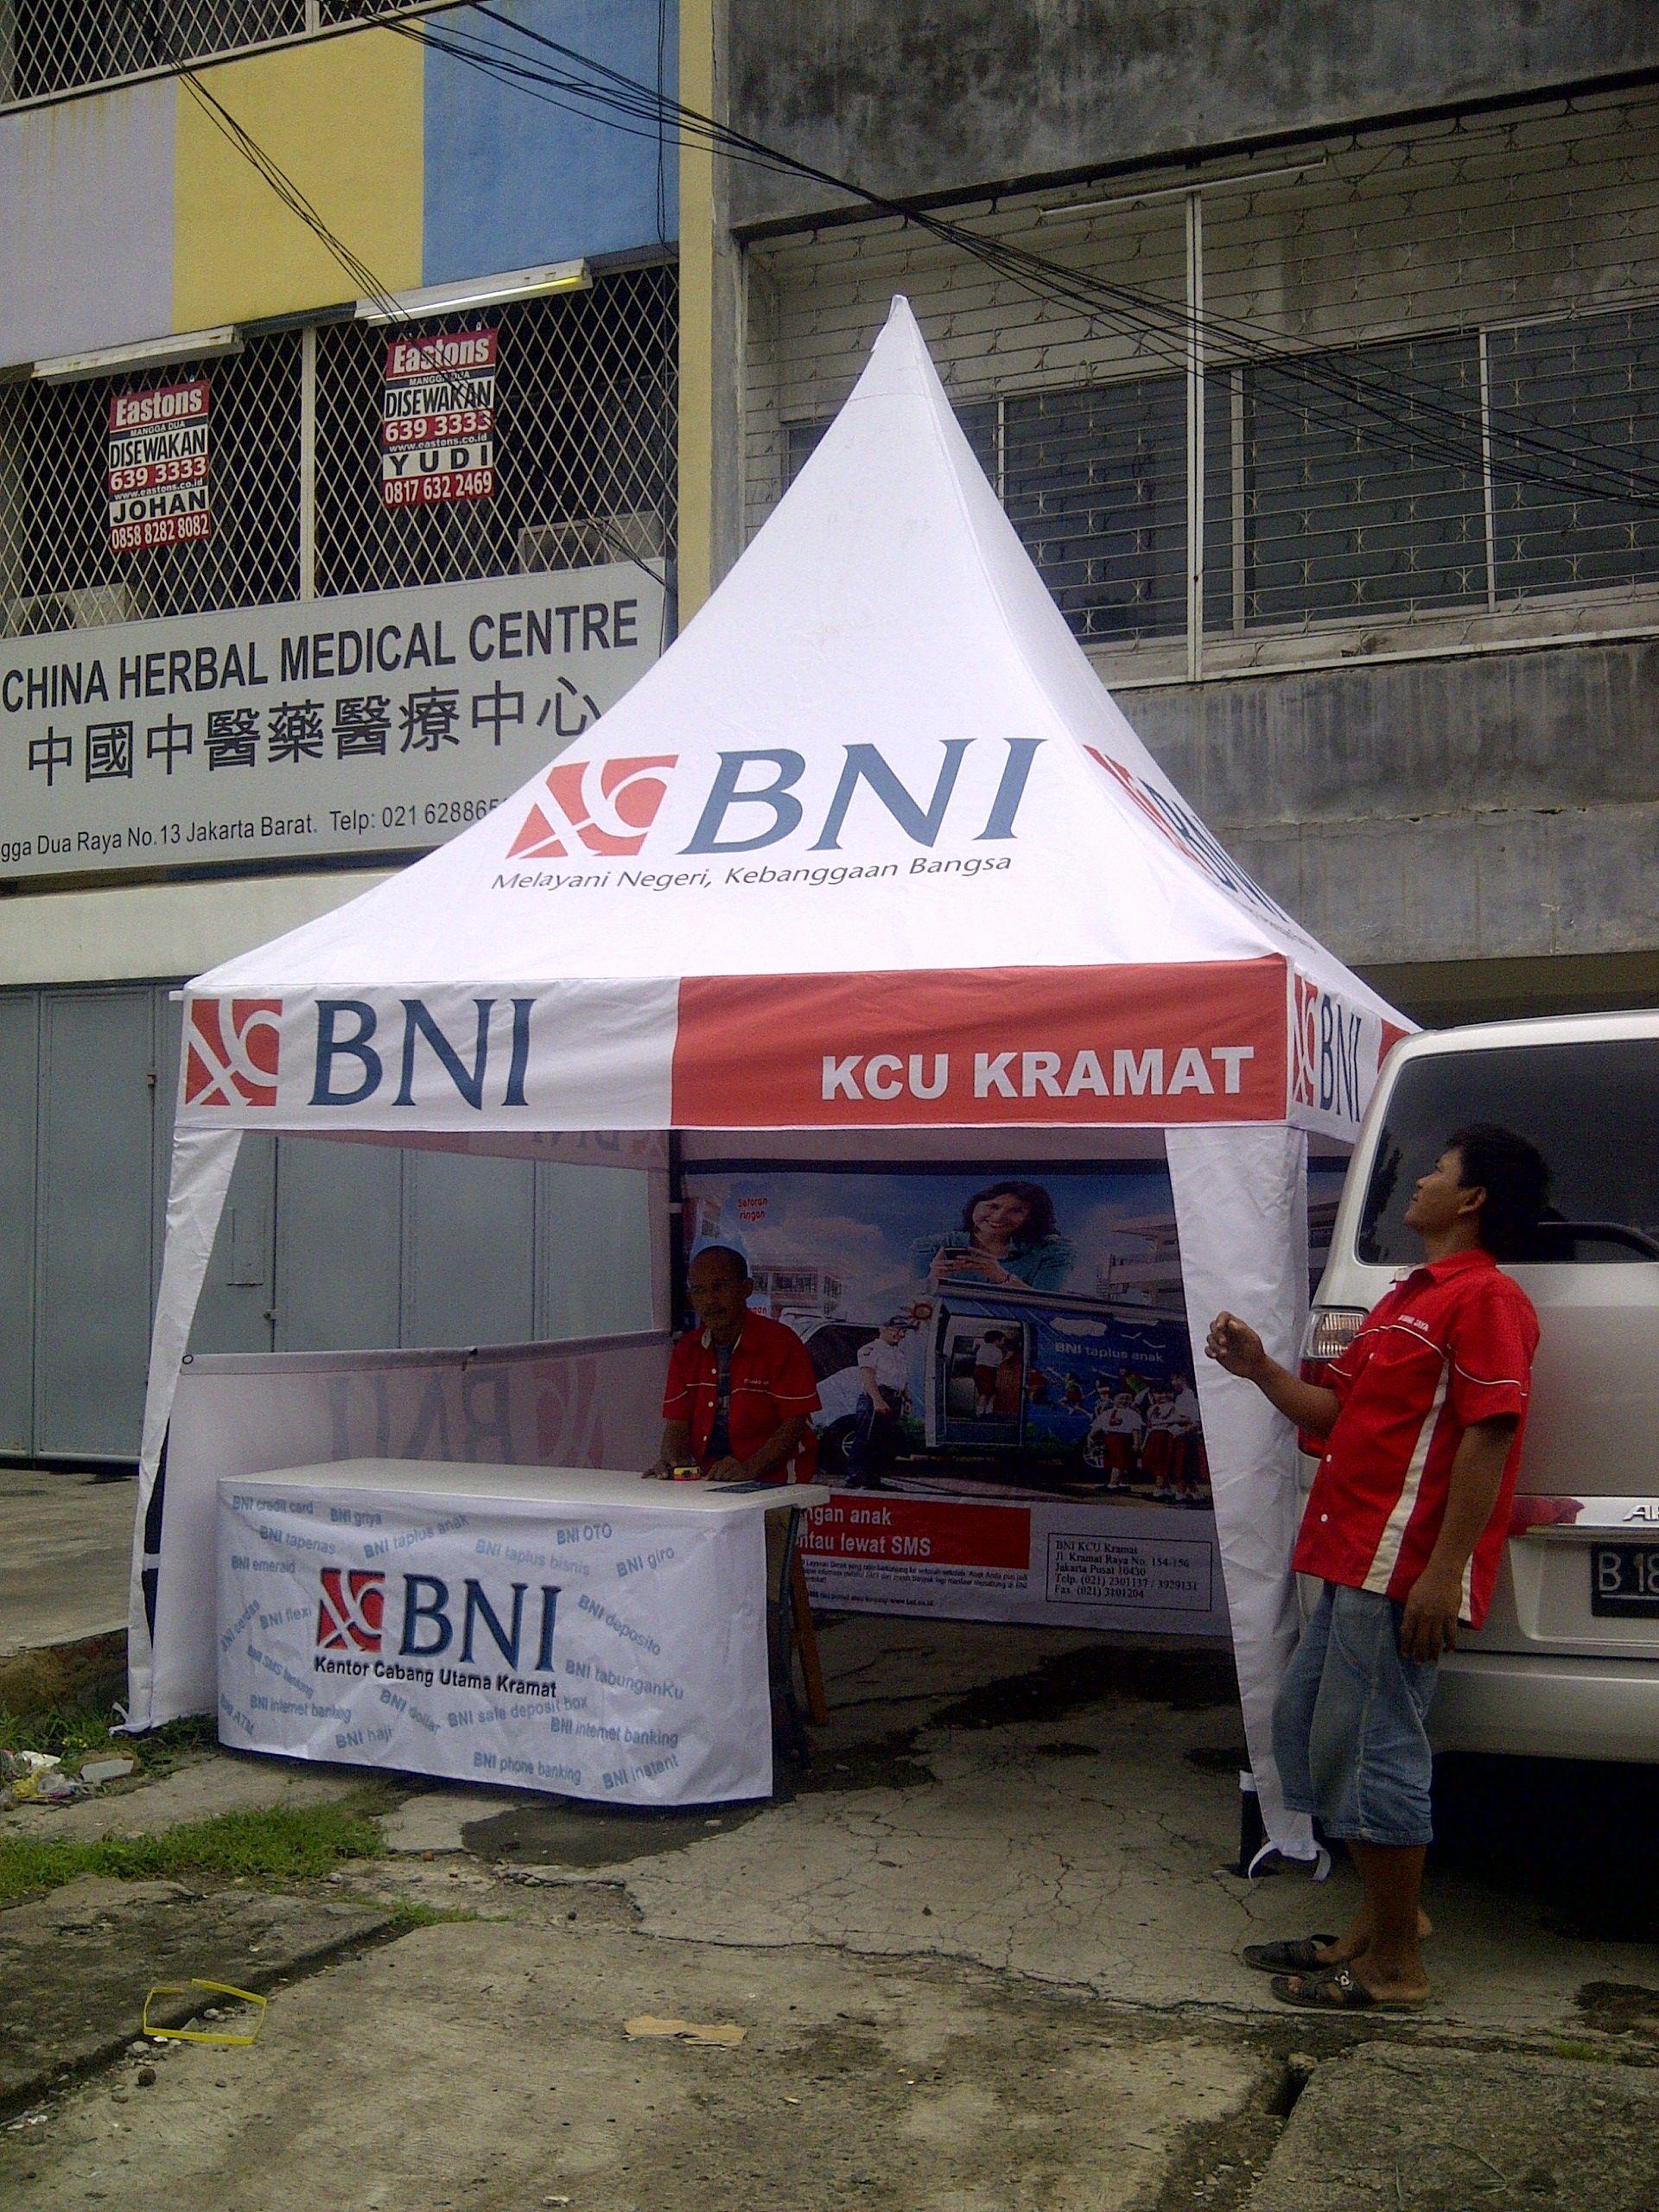 Jual Tenda Cafe Di Bandung (WA)O878.8626.4447 ,Jual Tenda